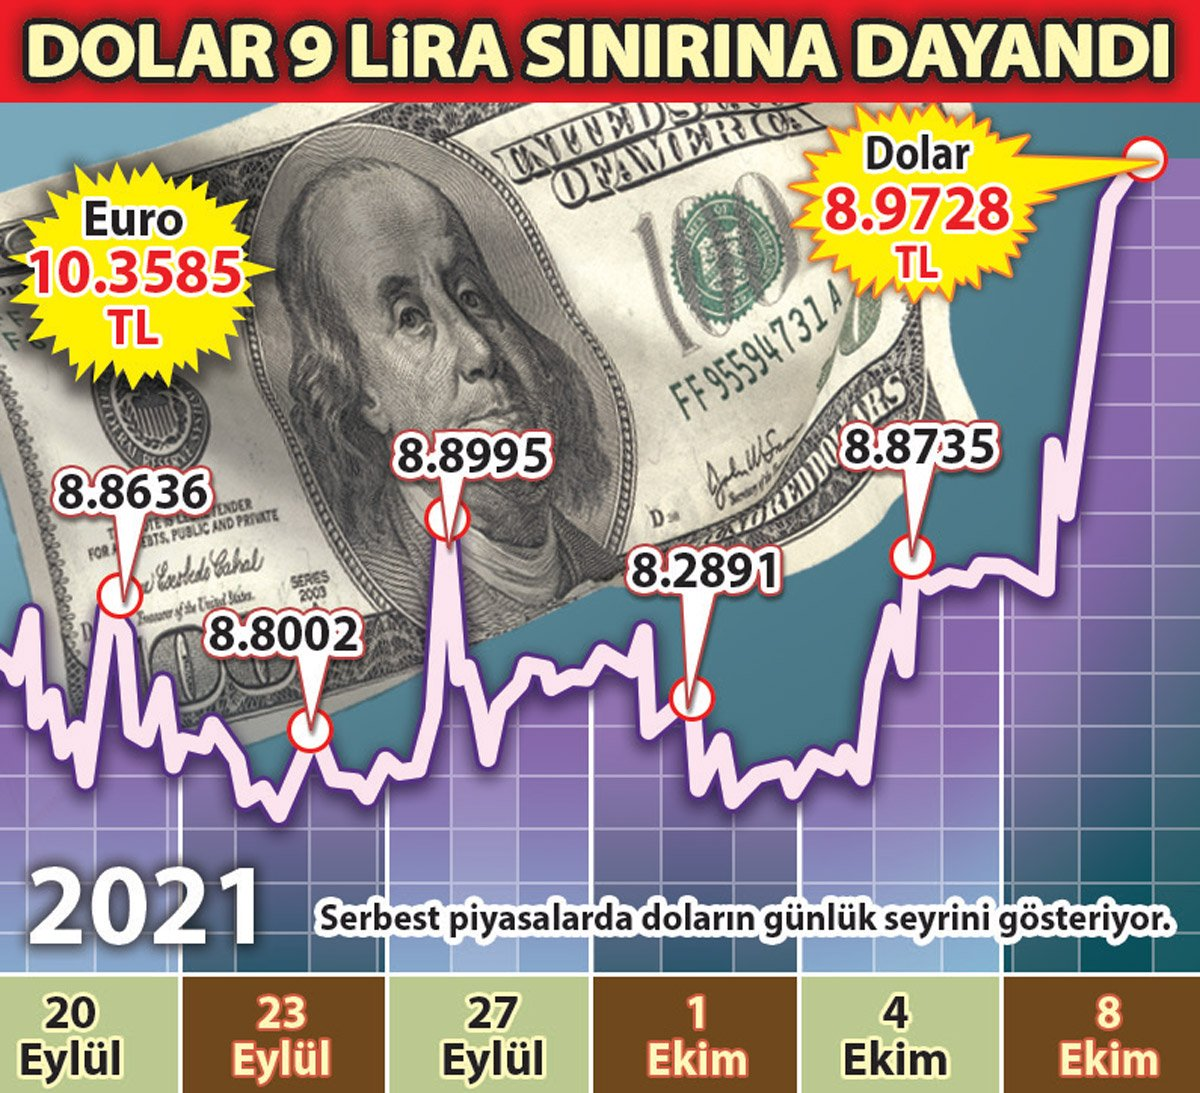 Güçlü dolar karşısında TL savunmasız kaldı